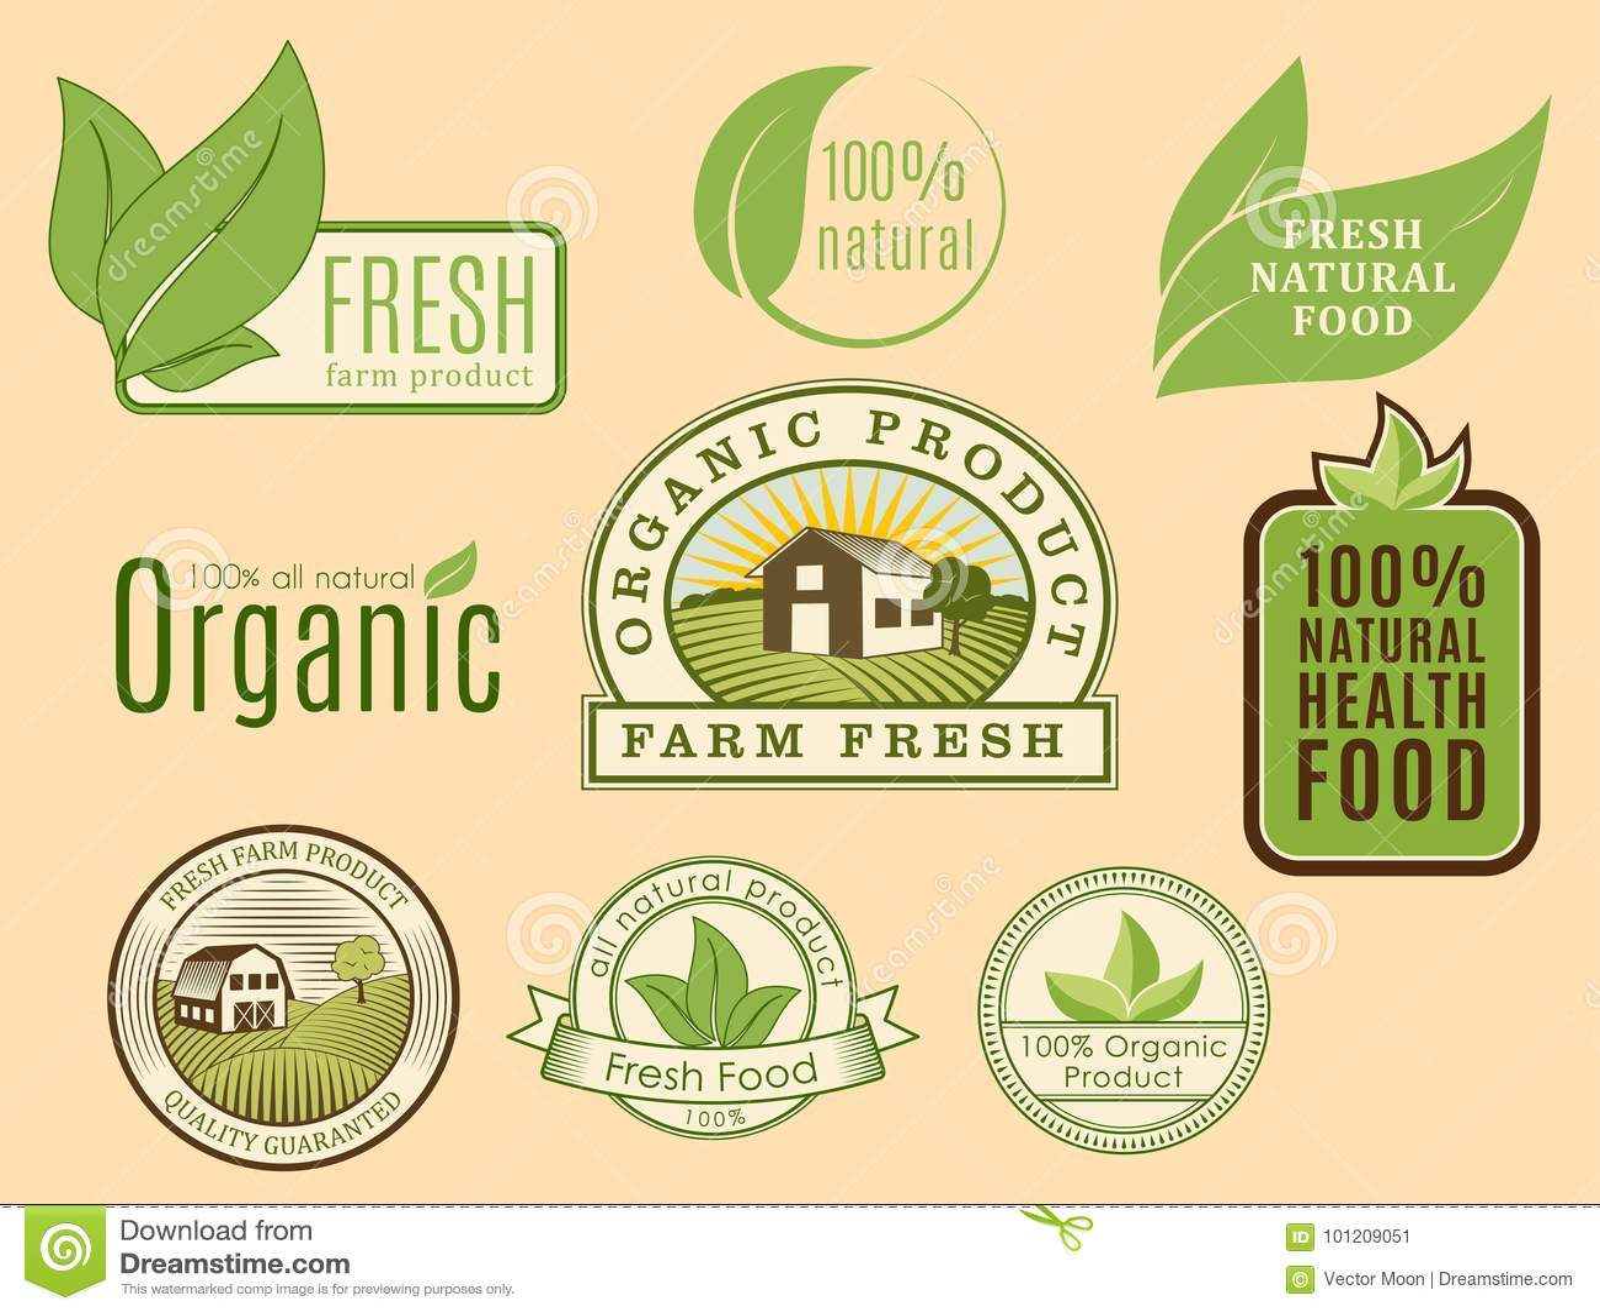 Bio Farm Organic Eco Healthy Food Templates And Vintage Vegan Green Color For Restaurant Menu Or Package Badge Vector Stock Vector Illustration Of Green Healthy 101209051